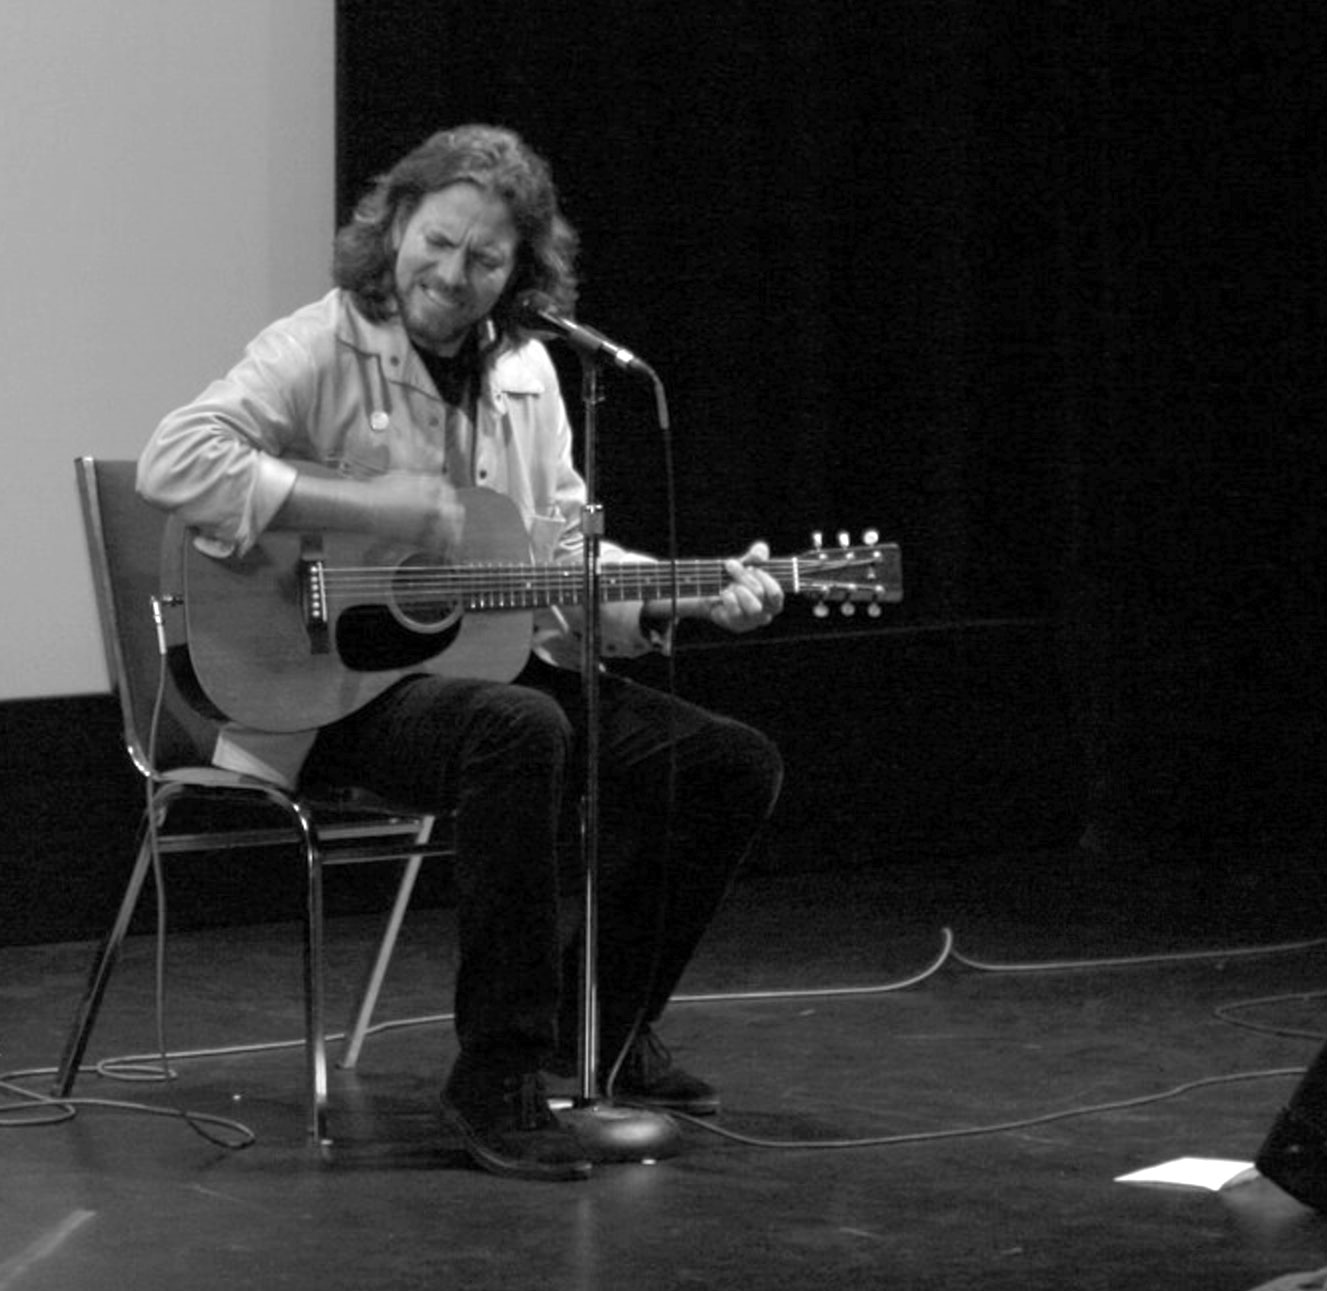 Eddie Vedder performing at the Toronto Int'l Film Festival